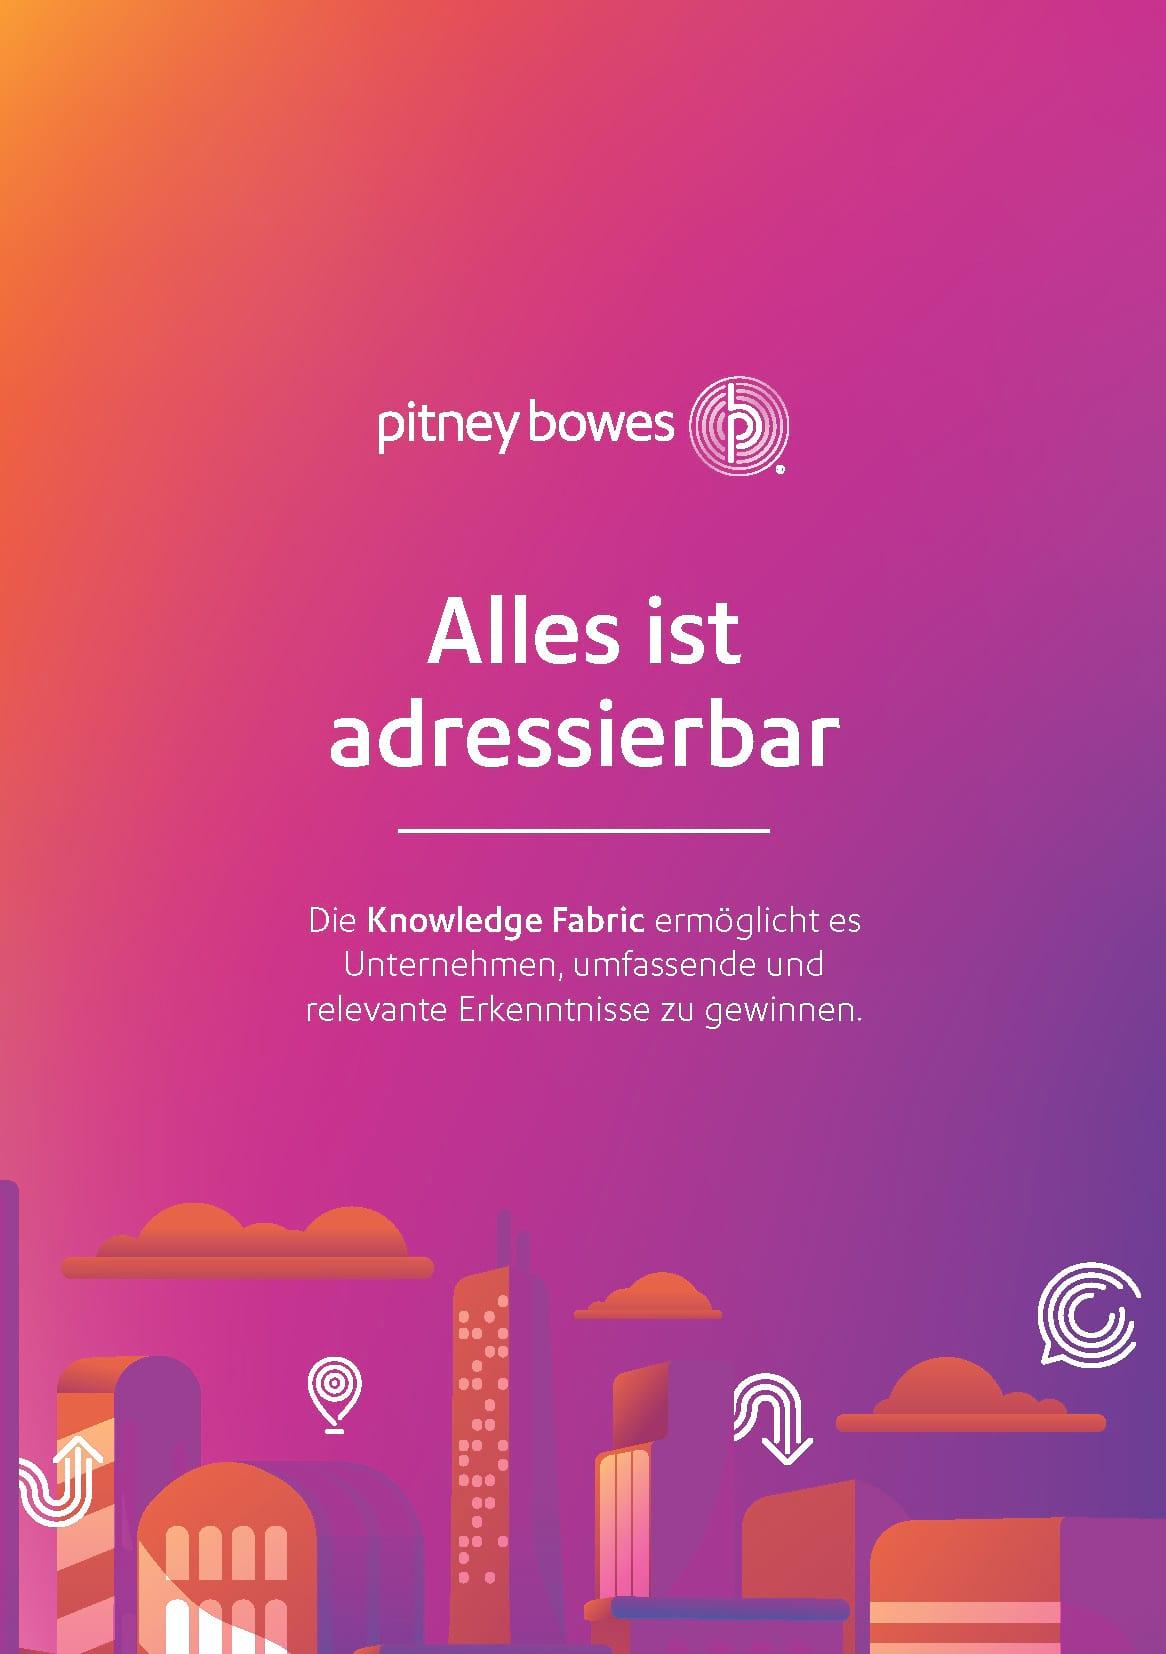 Pitney Bowes - summ-it Unternehmensberatung